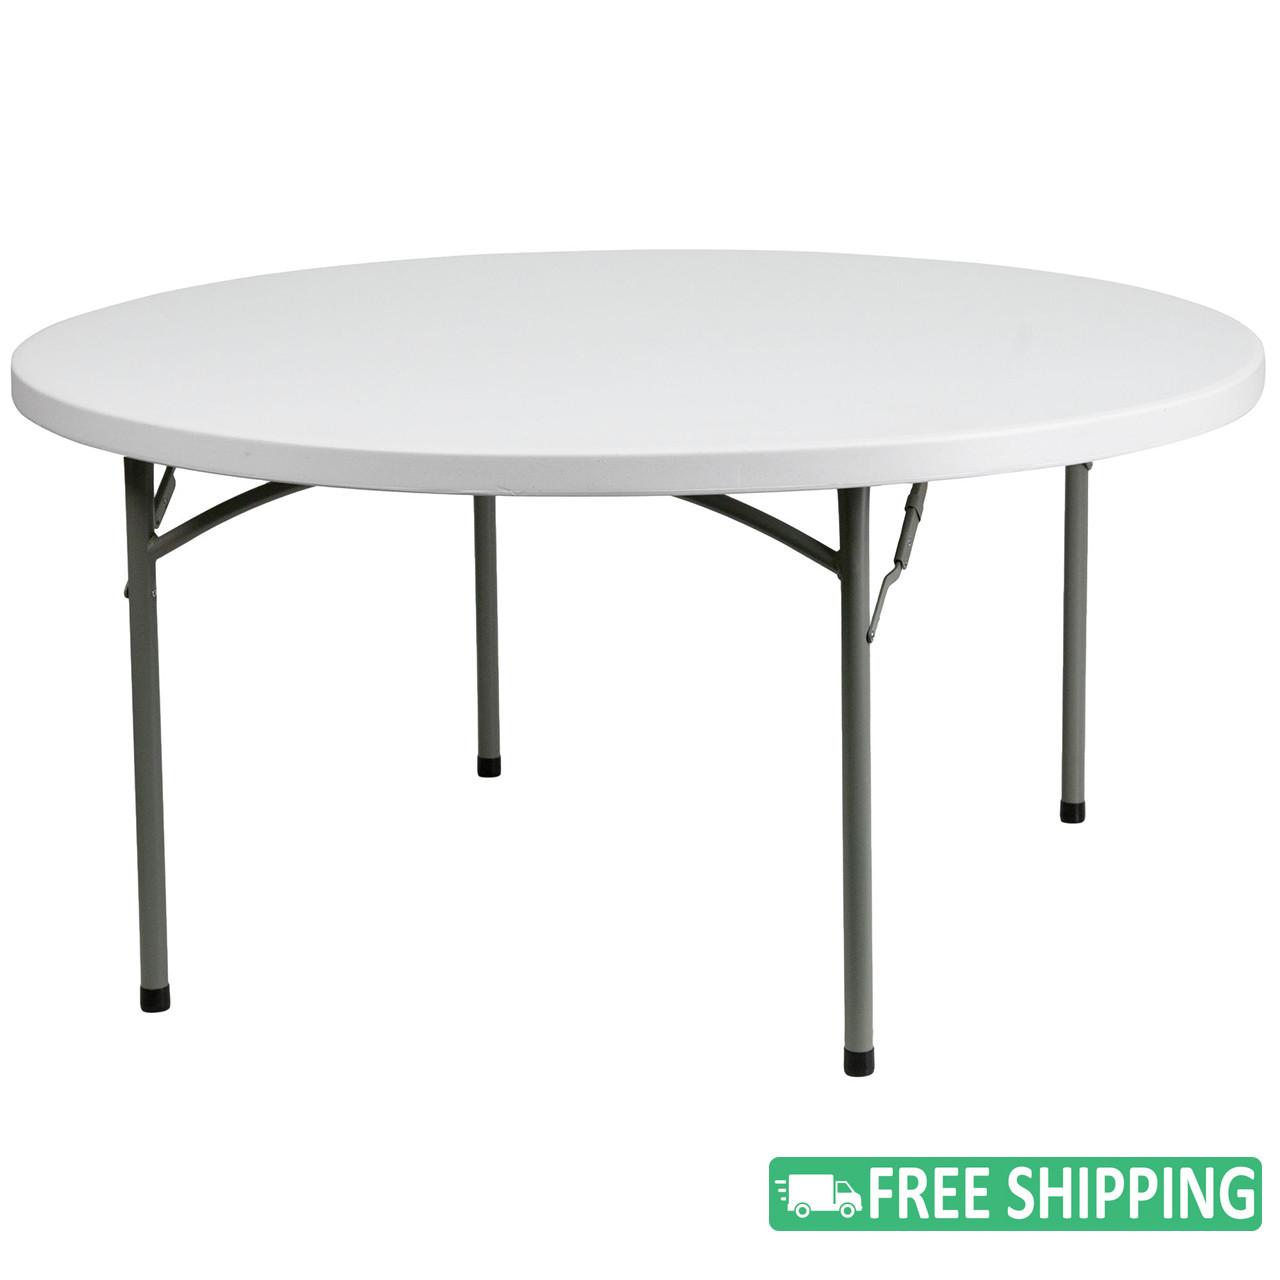 Remarkable 10 Pack Advantage 5 Ft Round White Plastic Folding Table 10 Dad Ycz 152R Gw Gg White Granite Download Free Architecture Designs Scobabritishbridgeorg